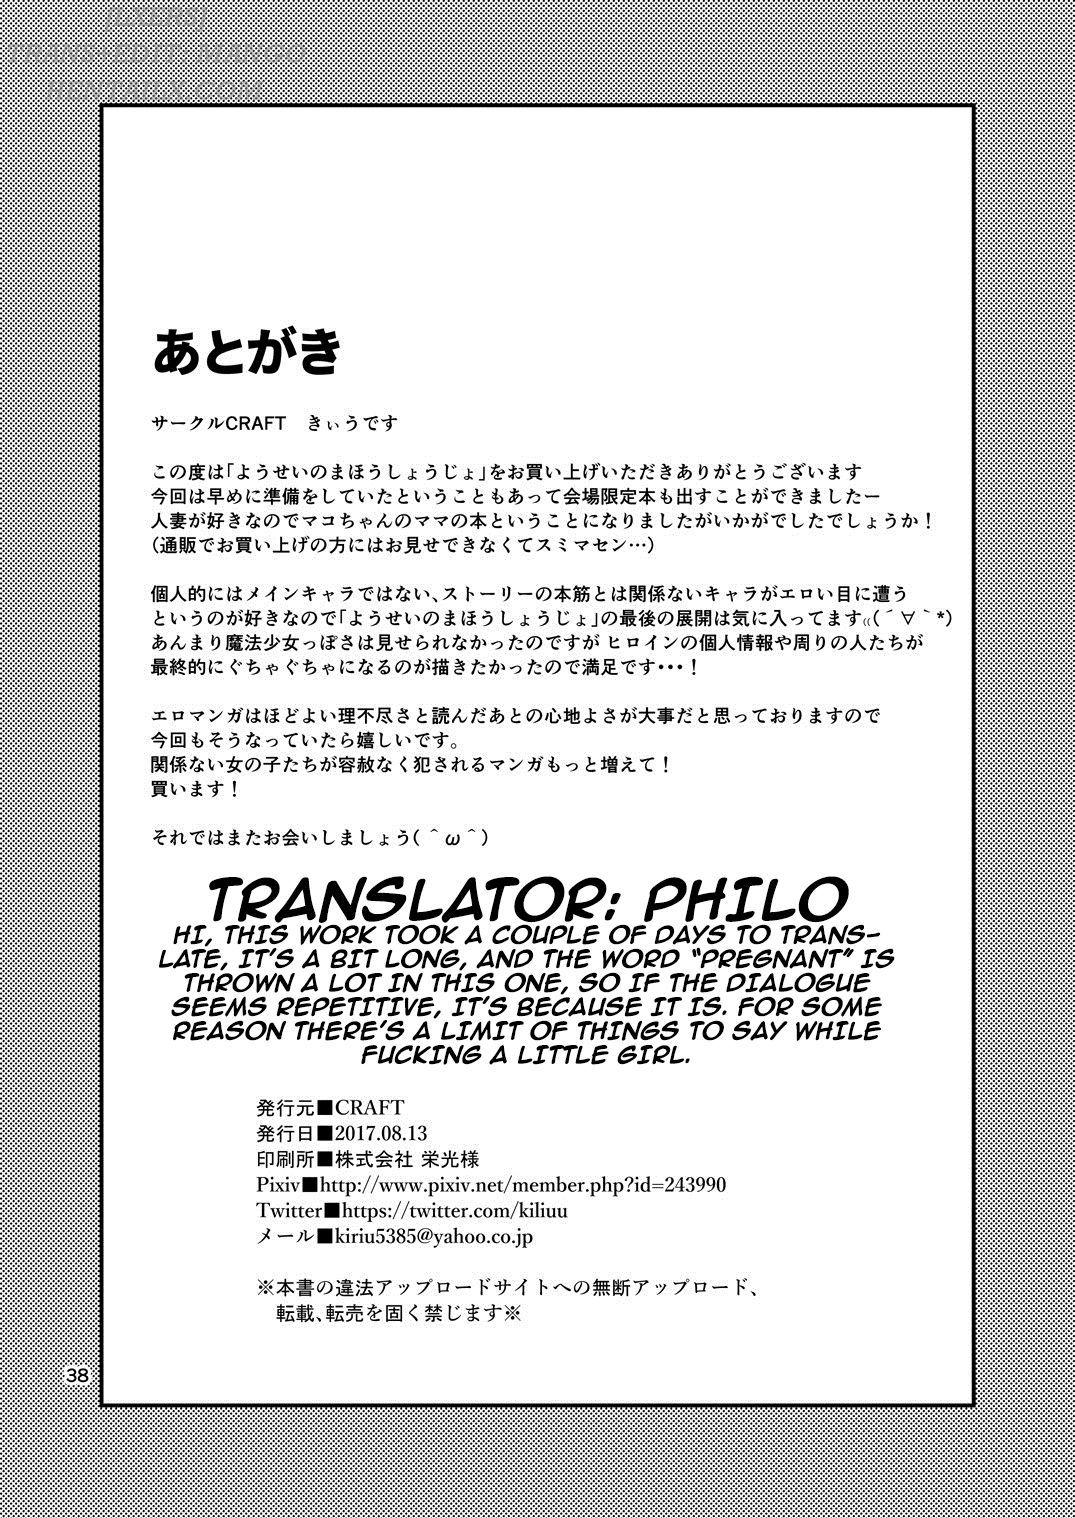 Hình ảnh 26437684968_df85c9c57f_o trong bài viết Yousei no Mahou Shoujo